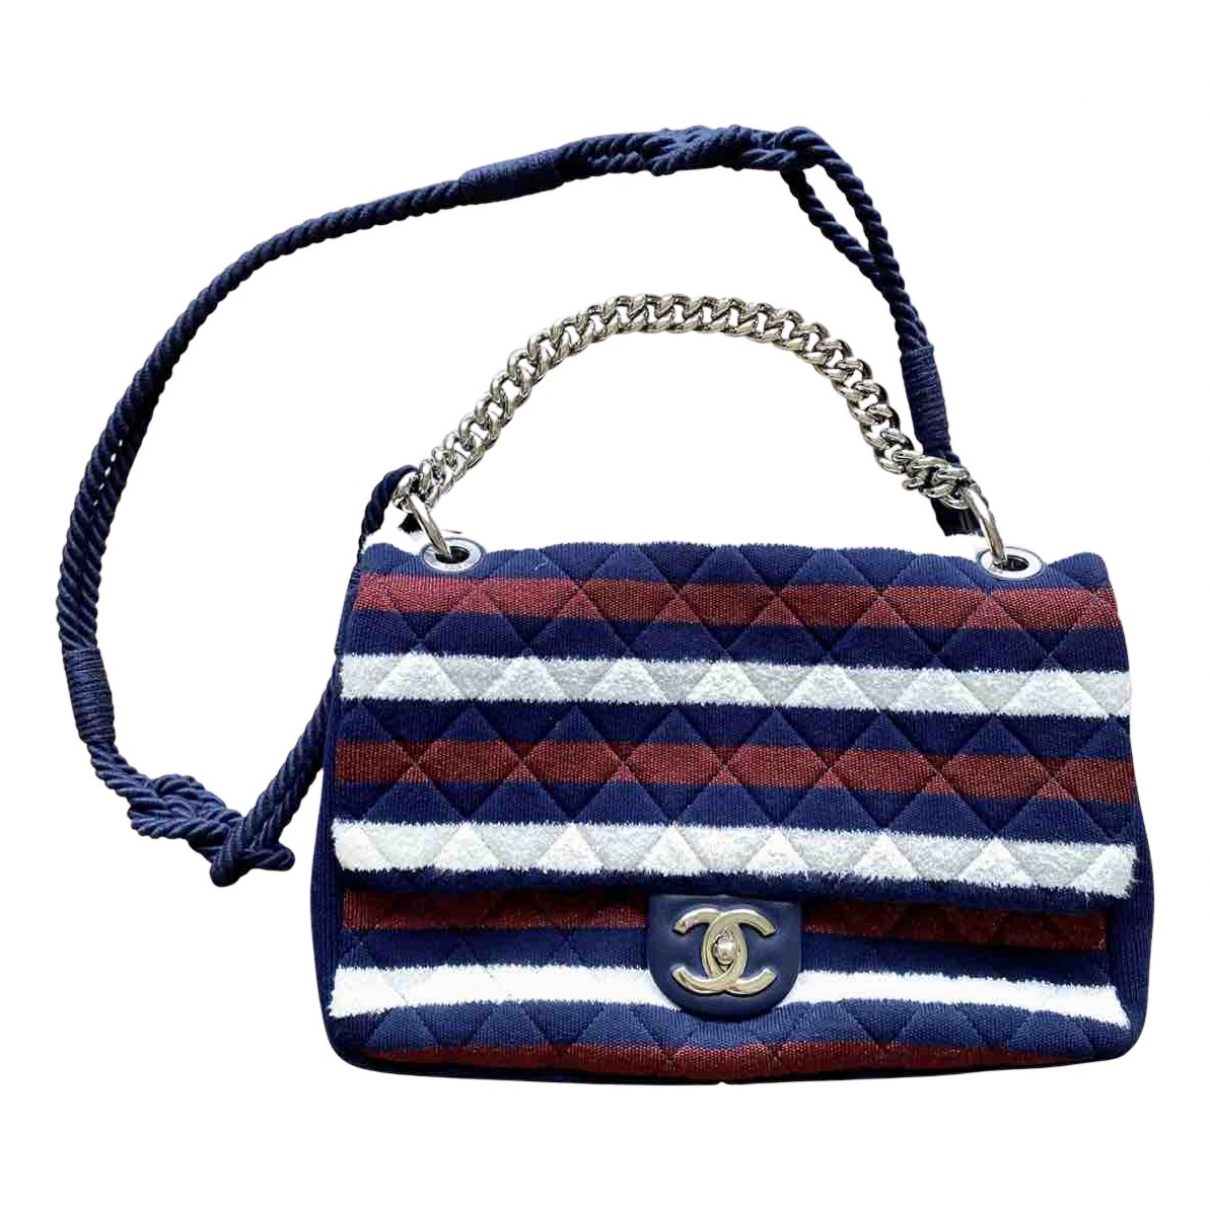 Chanel Timeless/Classique Multicolour Cloth handbag for Women N